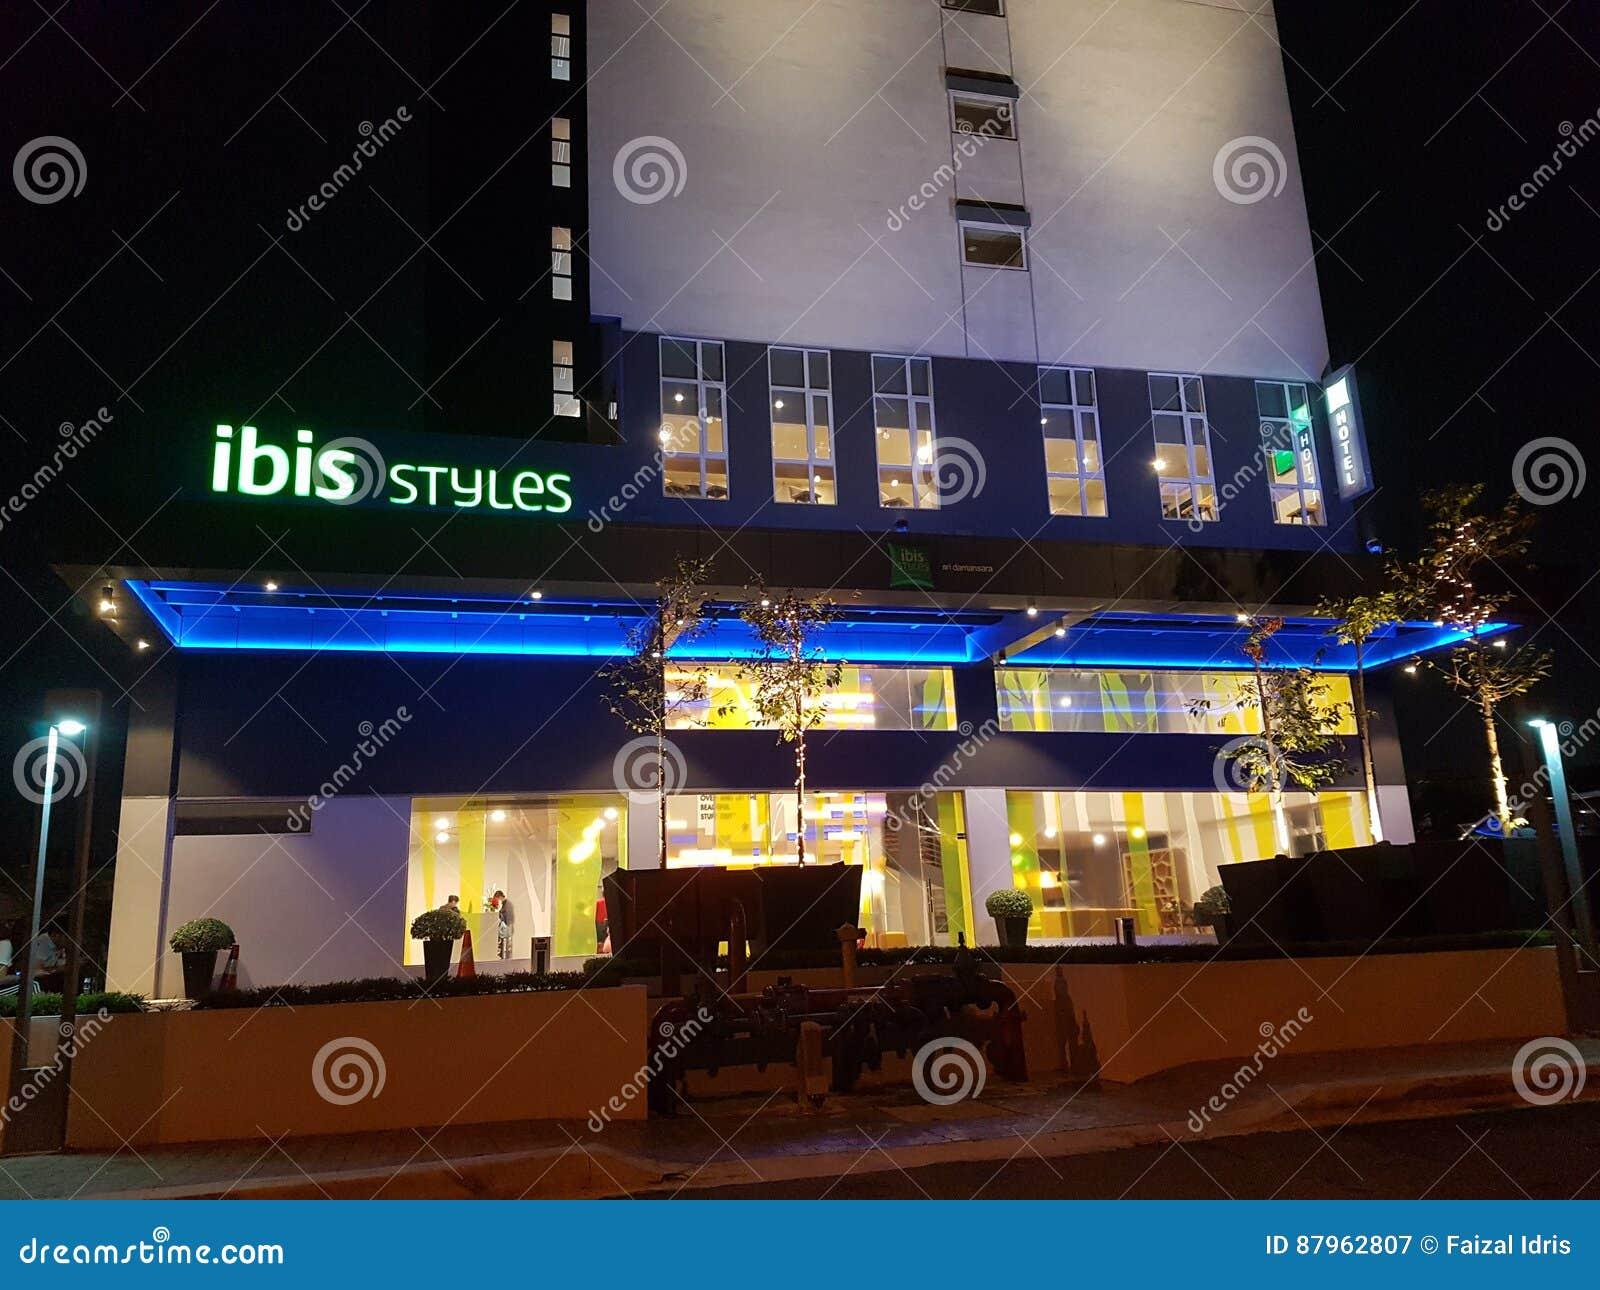 6 March 2017 Kuala Lumpur The Ibis Styles Kuala Lumpur Sri